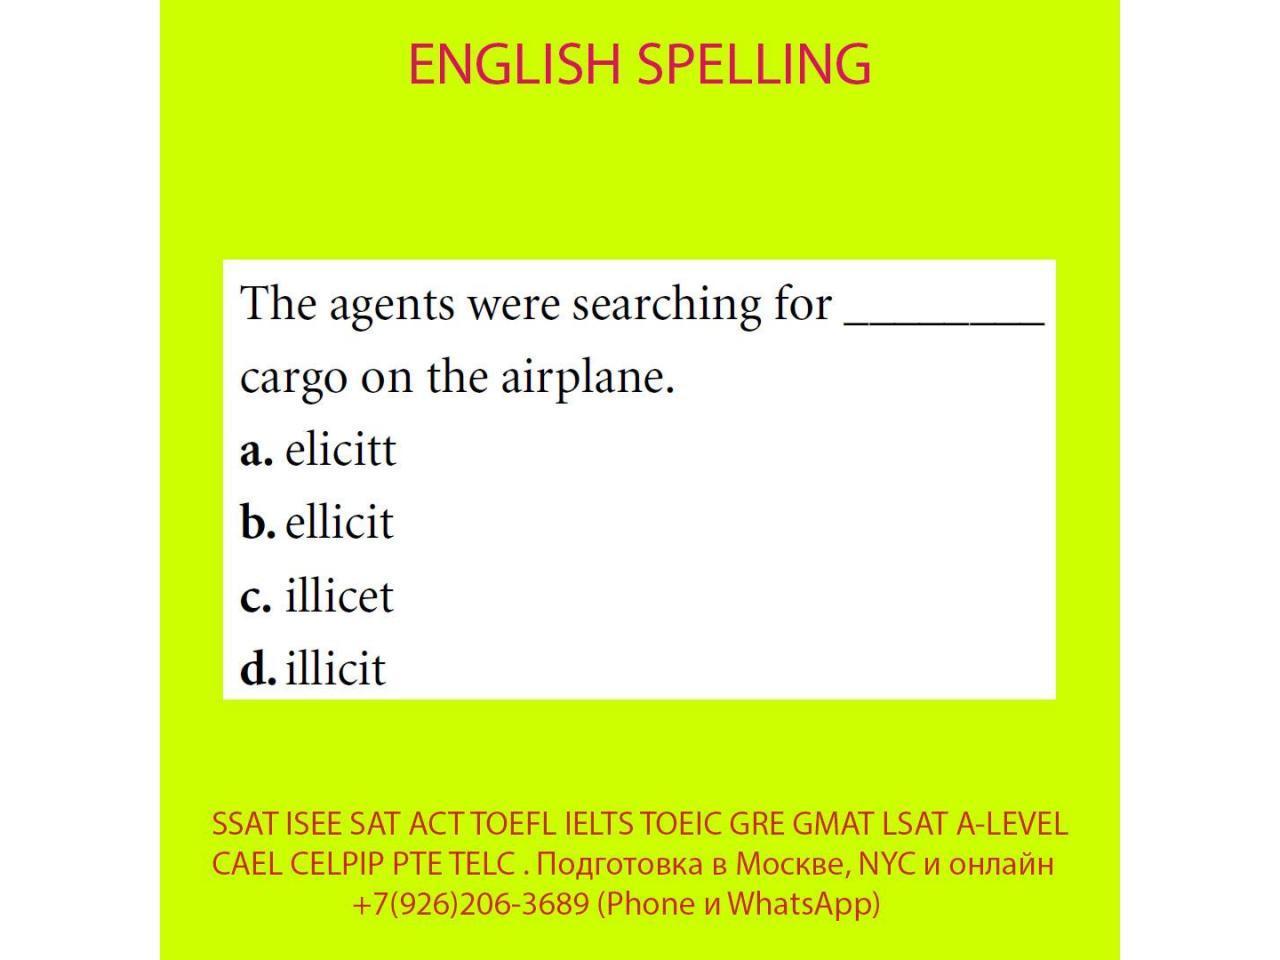 Подготовка к SSAT ISEE SAT ACT TOEFL IELTS TOEIC GRE GMAT LSAT A-LEVEL BEC CAEL CELPIP PTE TELC - 10